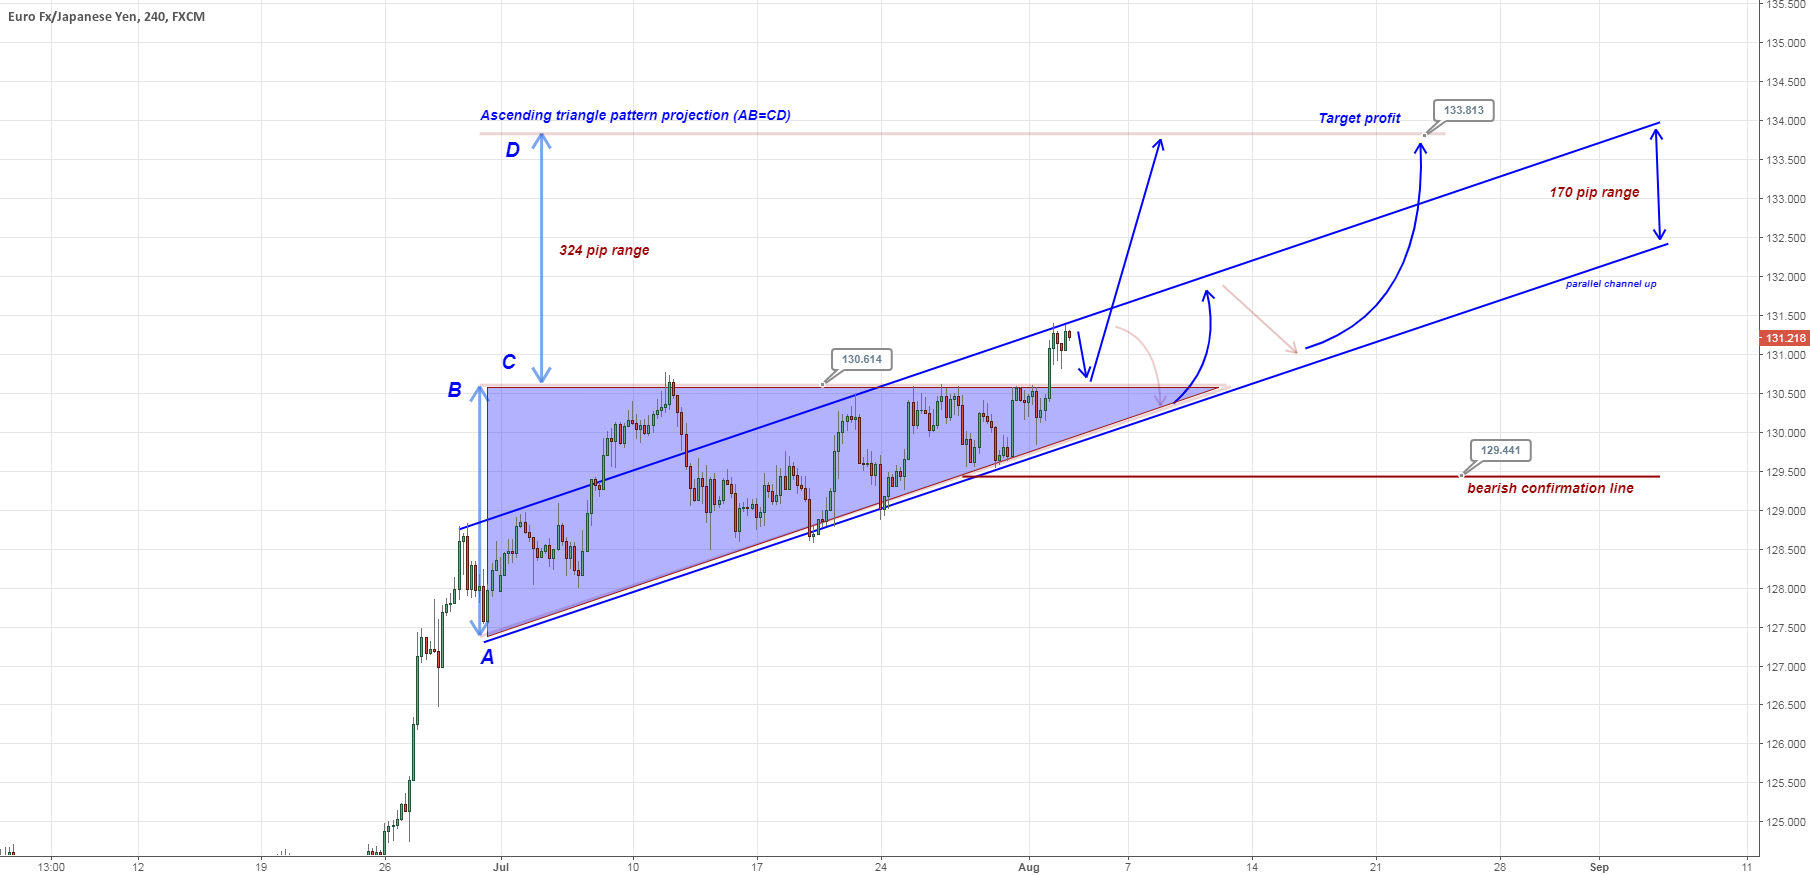 Ascending triangle break up